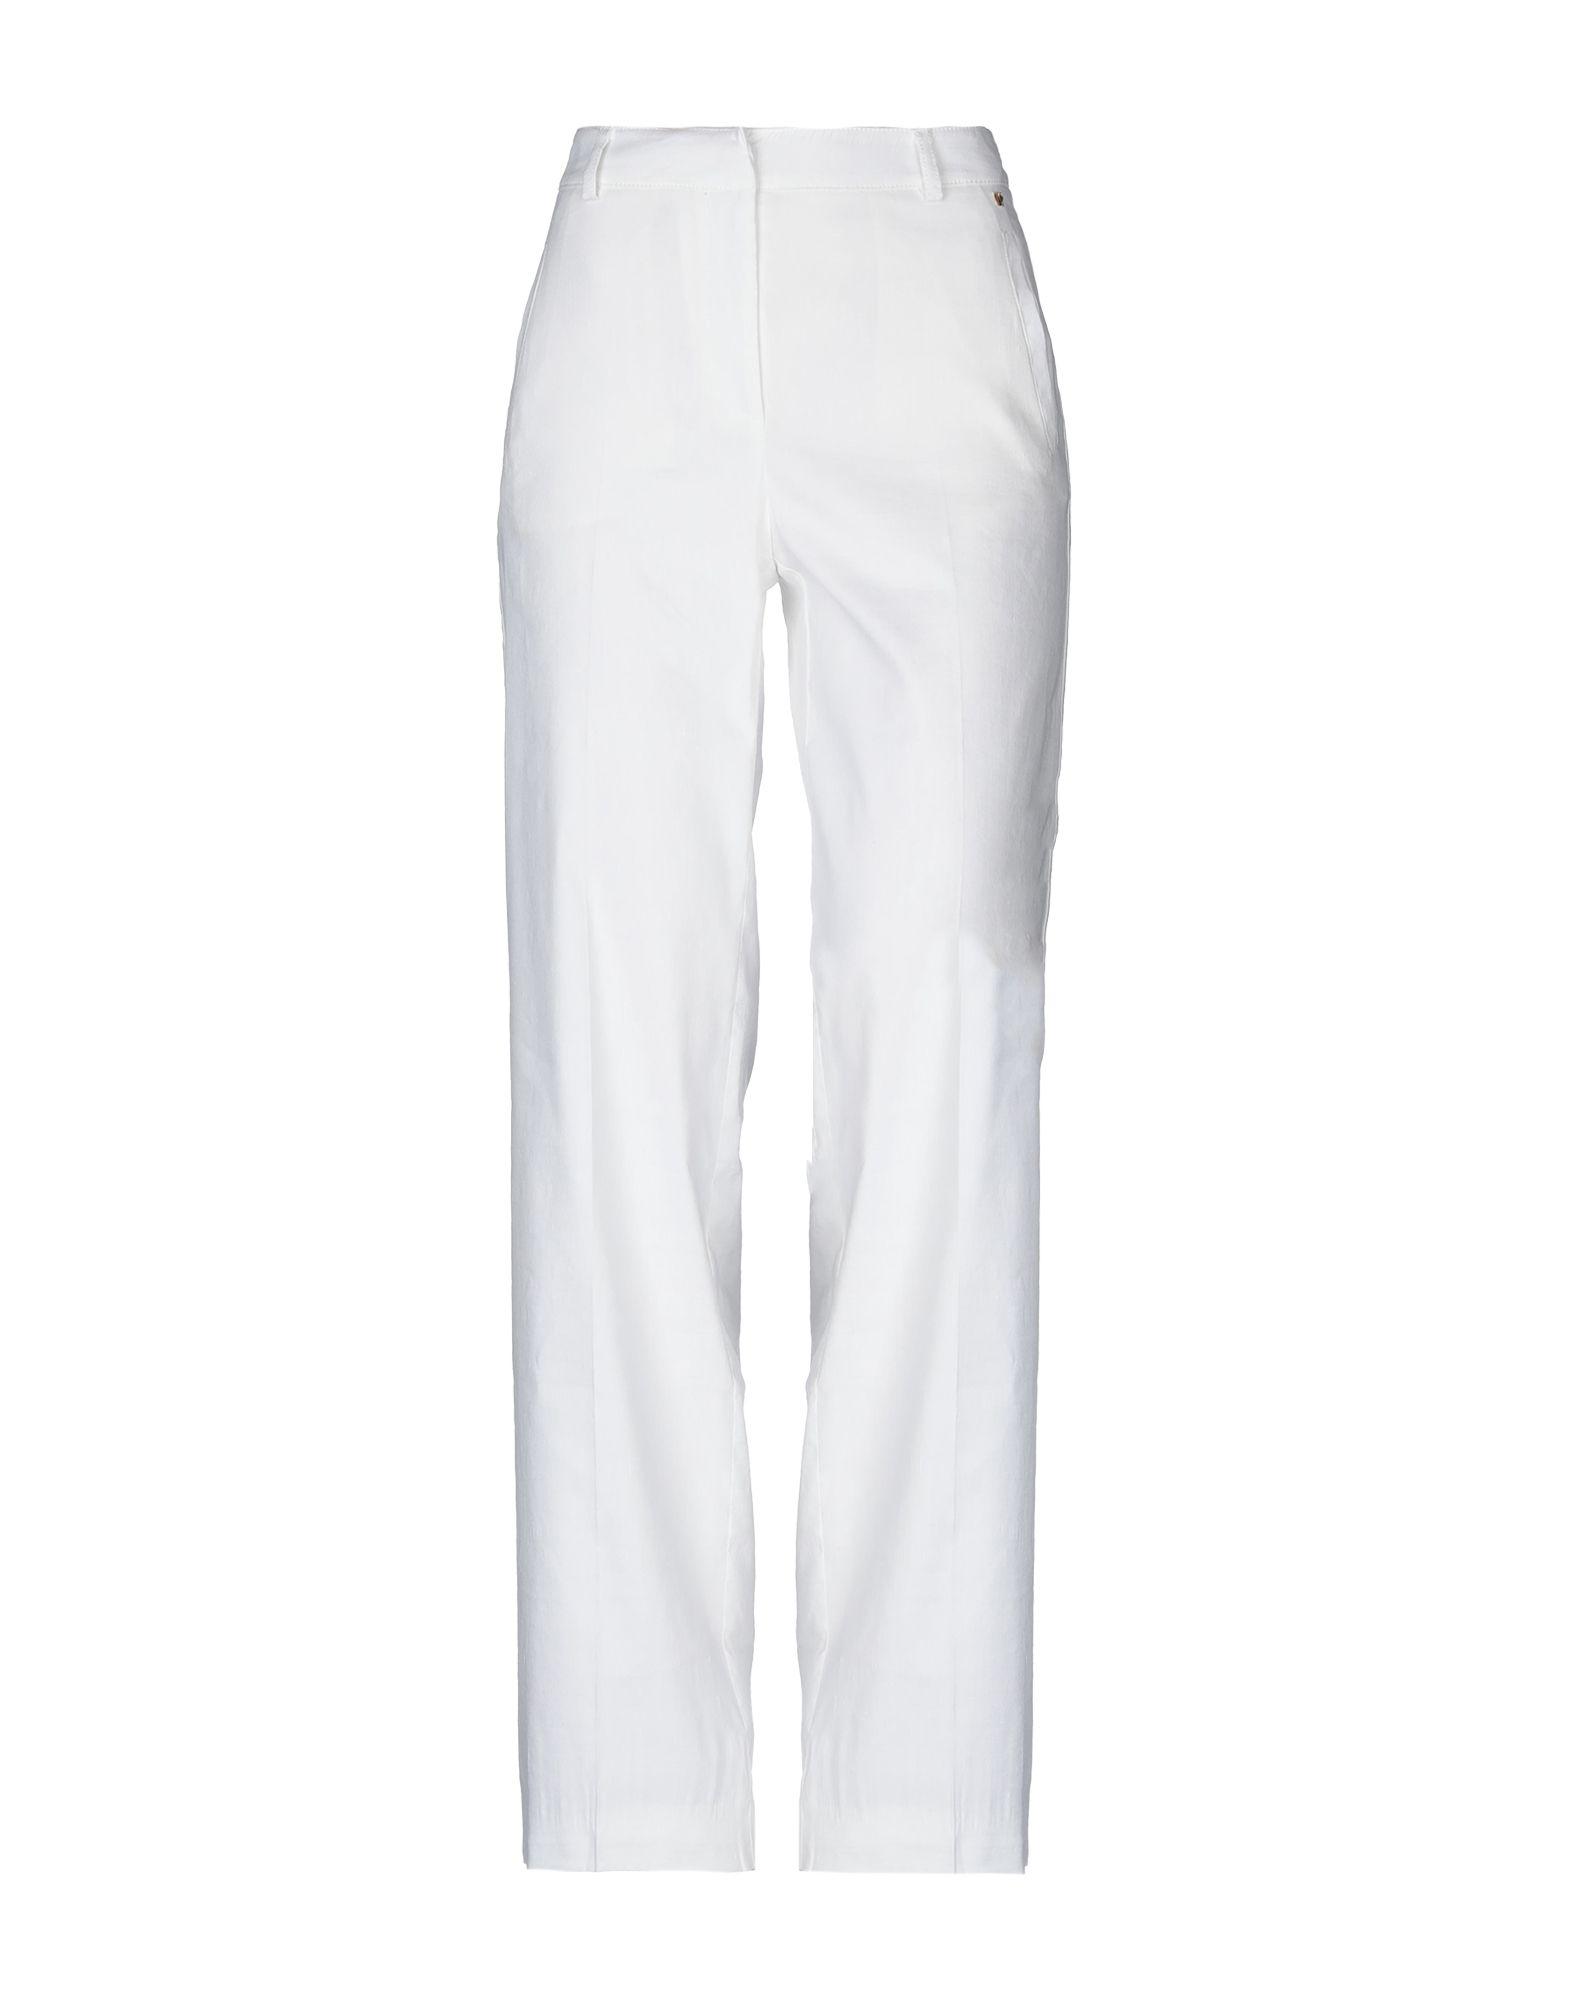 Фото - VDP COLLECTION Повседневные брюки vdp collection брюки капри